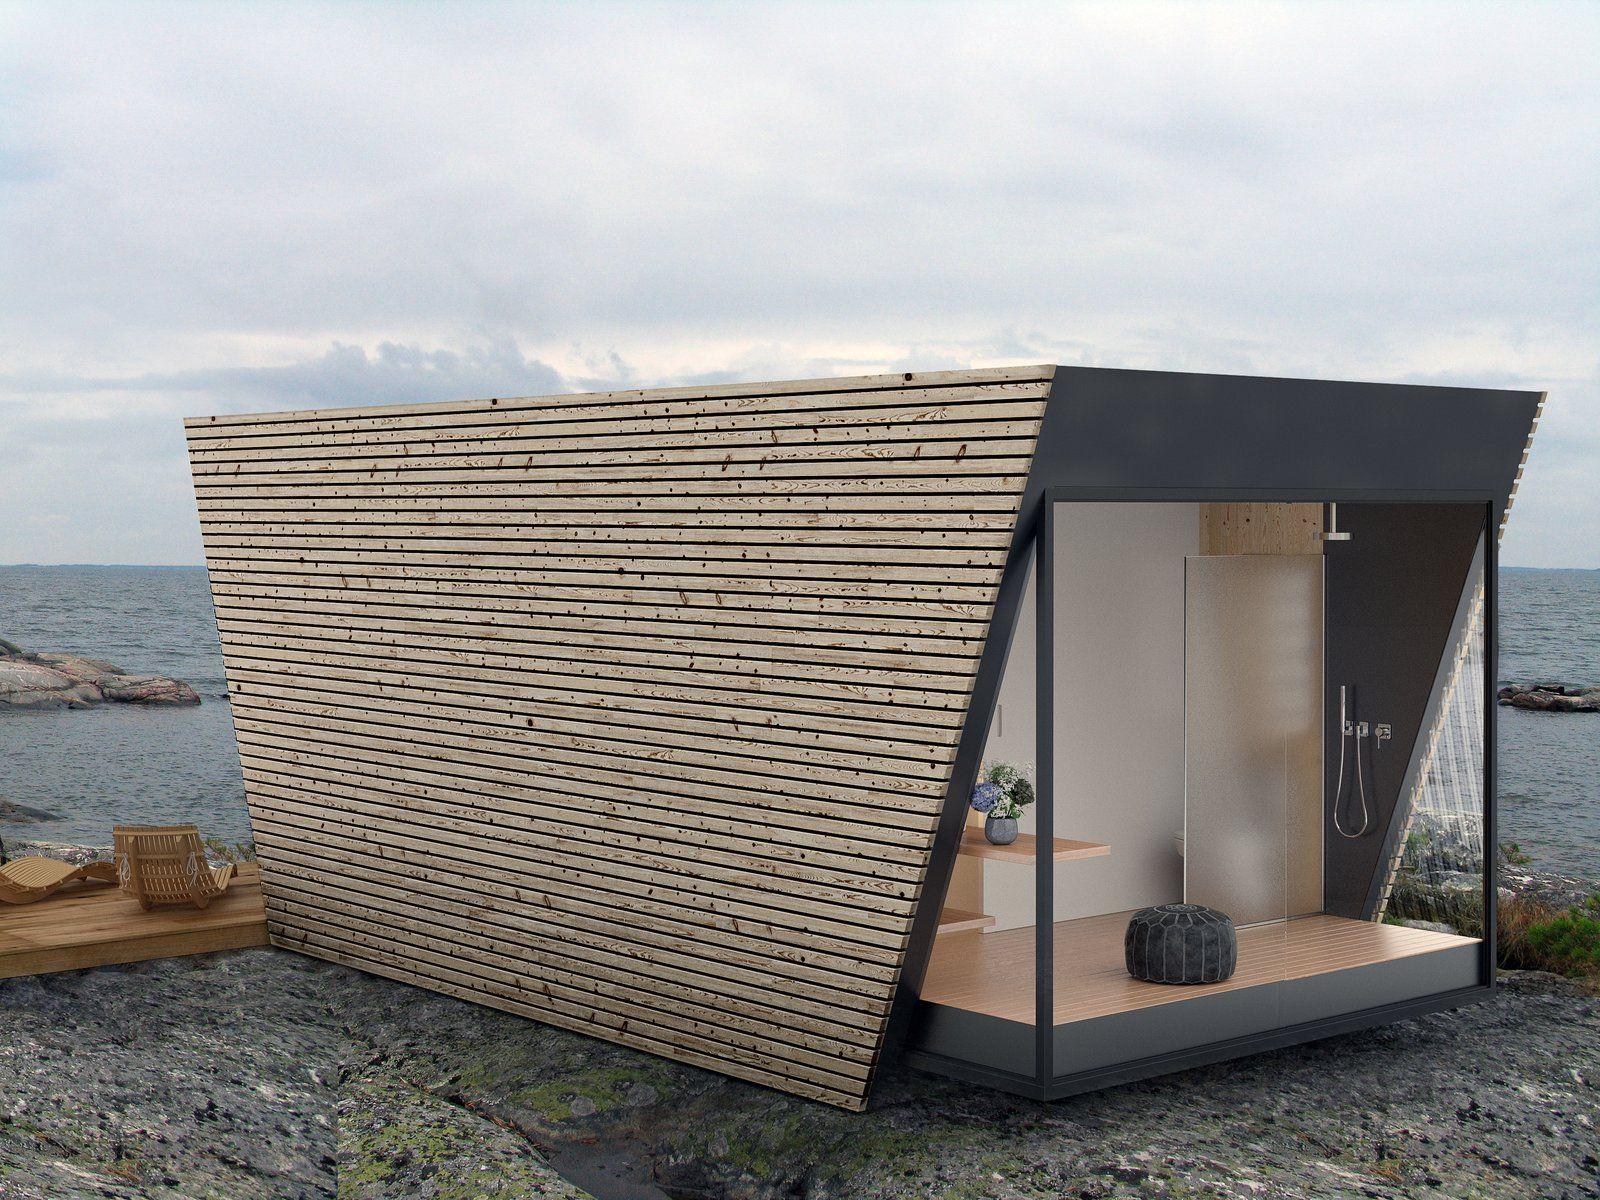 Piccola Casa Prefabbricata In Legno Dwelle, Prezzi Tra I 20 E I 40 Mila  Euro   BCasa | Pod | Pinterest | Tiny Houses, Micro House And Euro